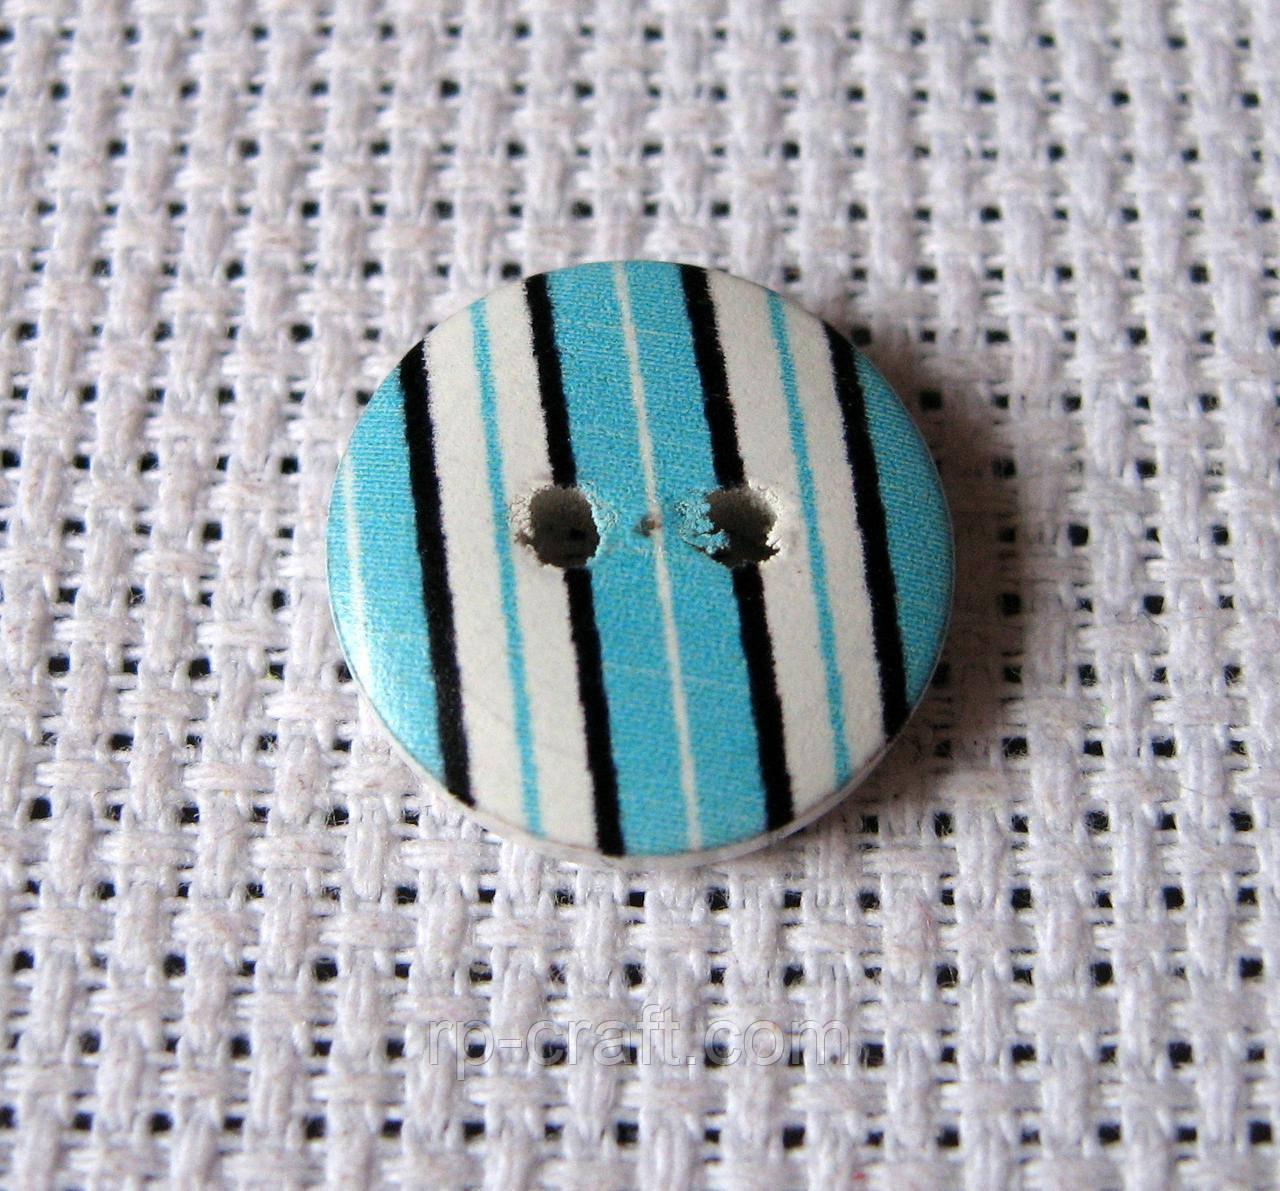 Пуговица деревянная, декоративная. 15 мм